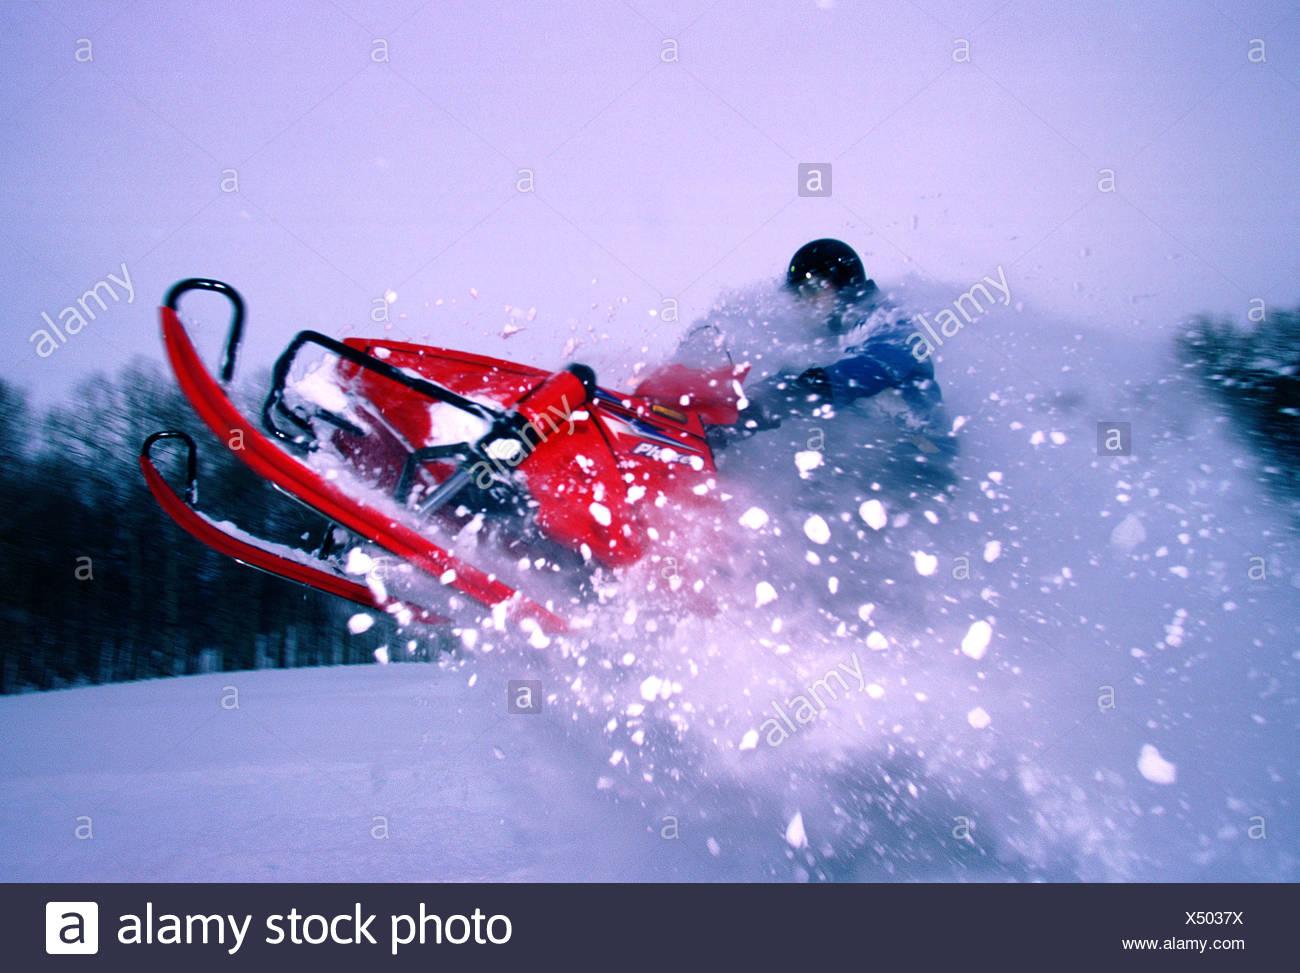 Snowmobile launching through powder snow - Stock Image